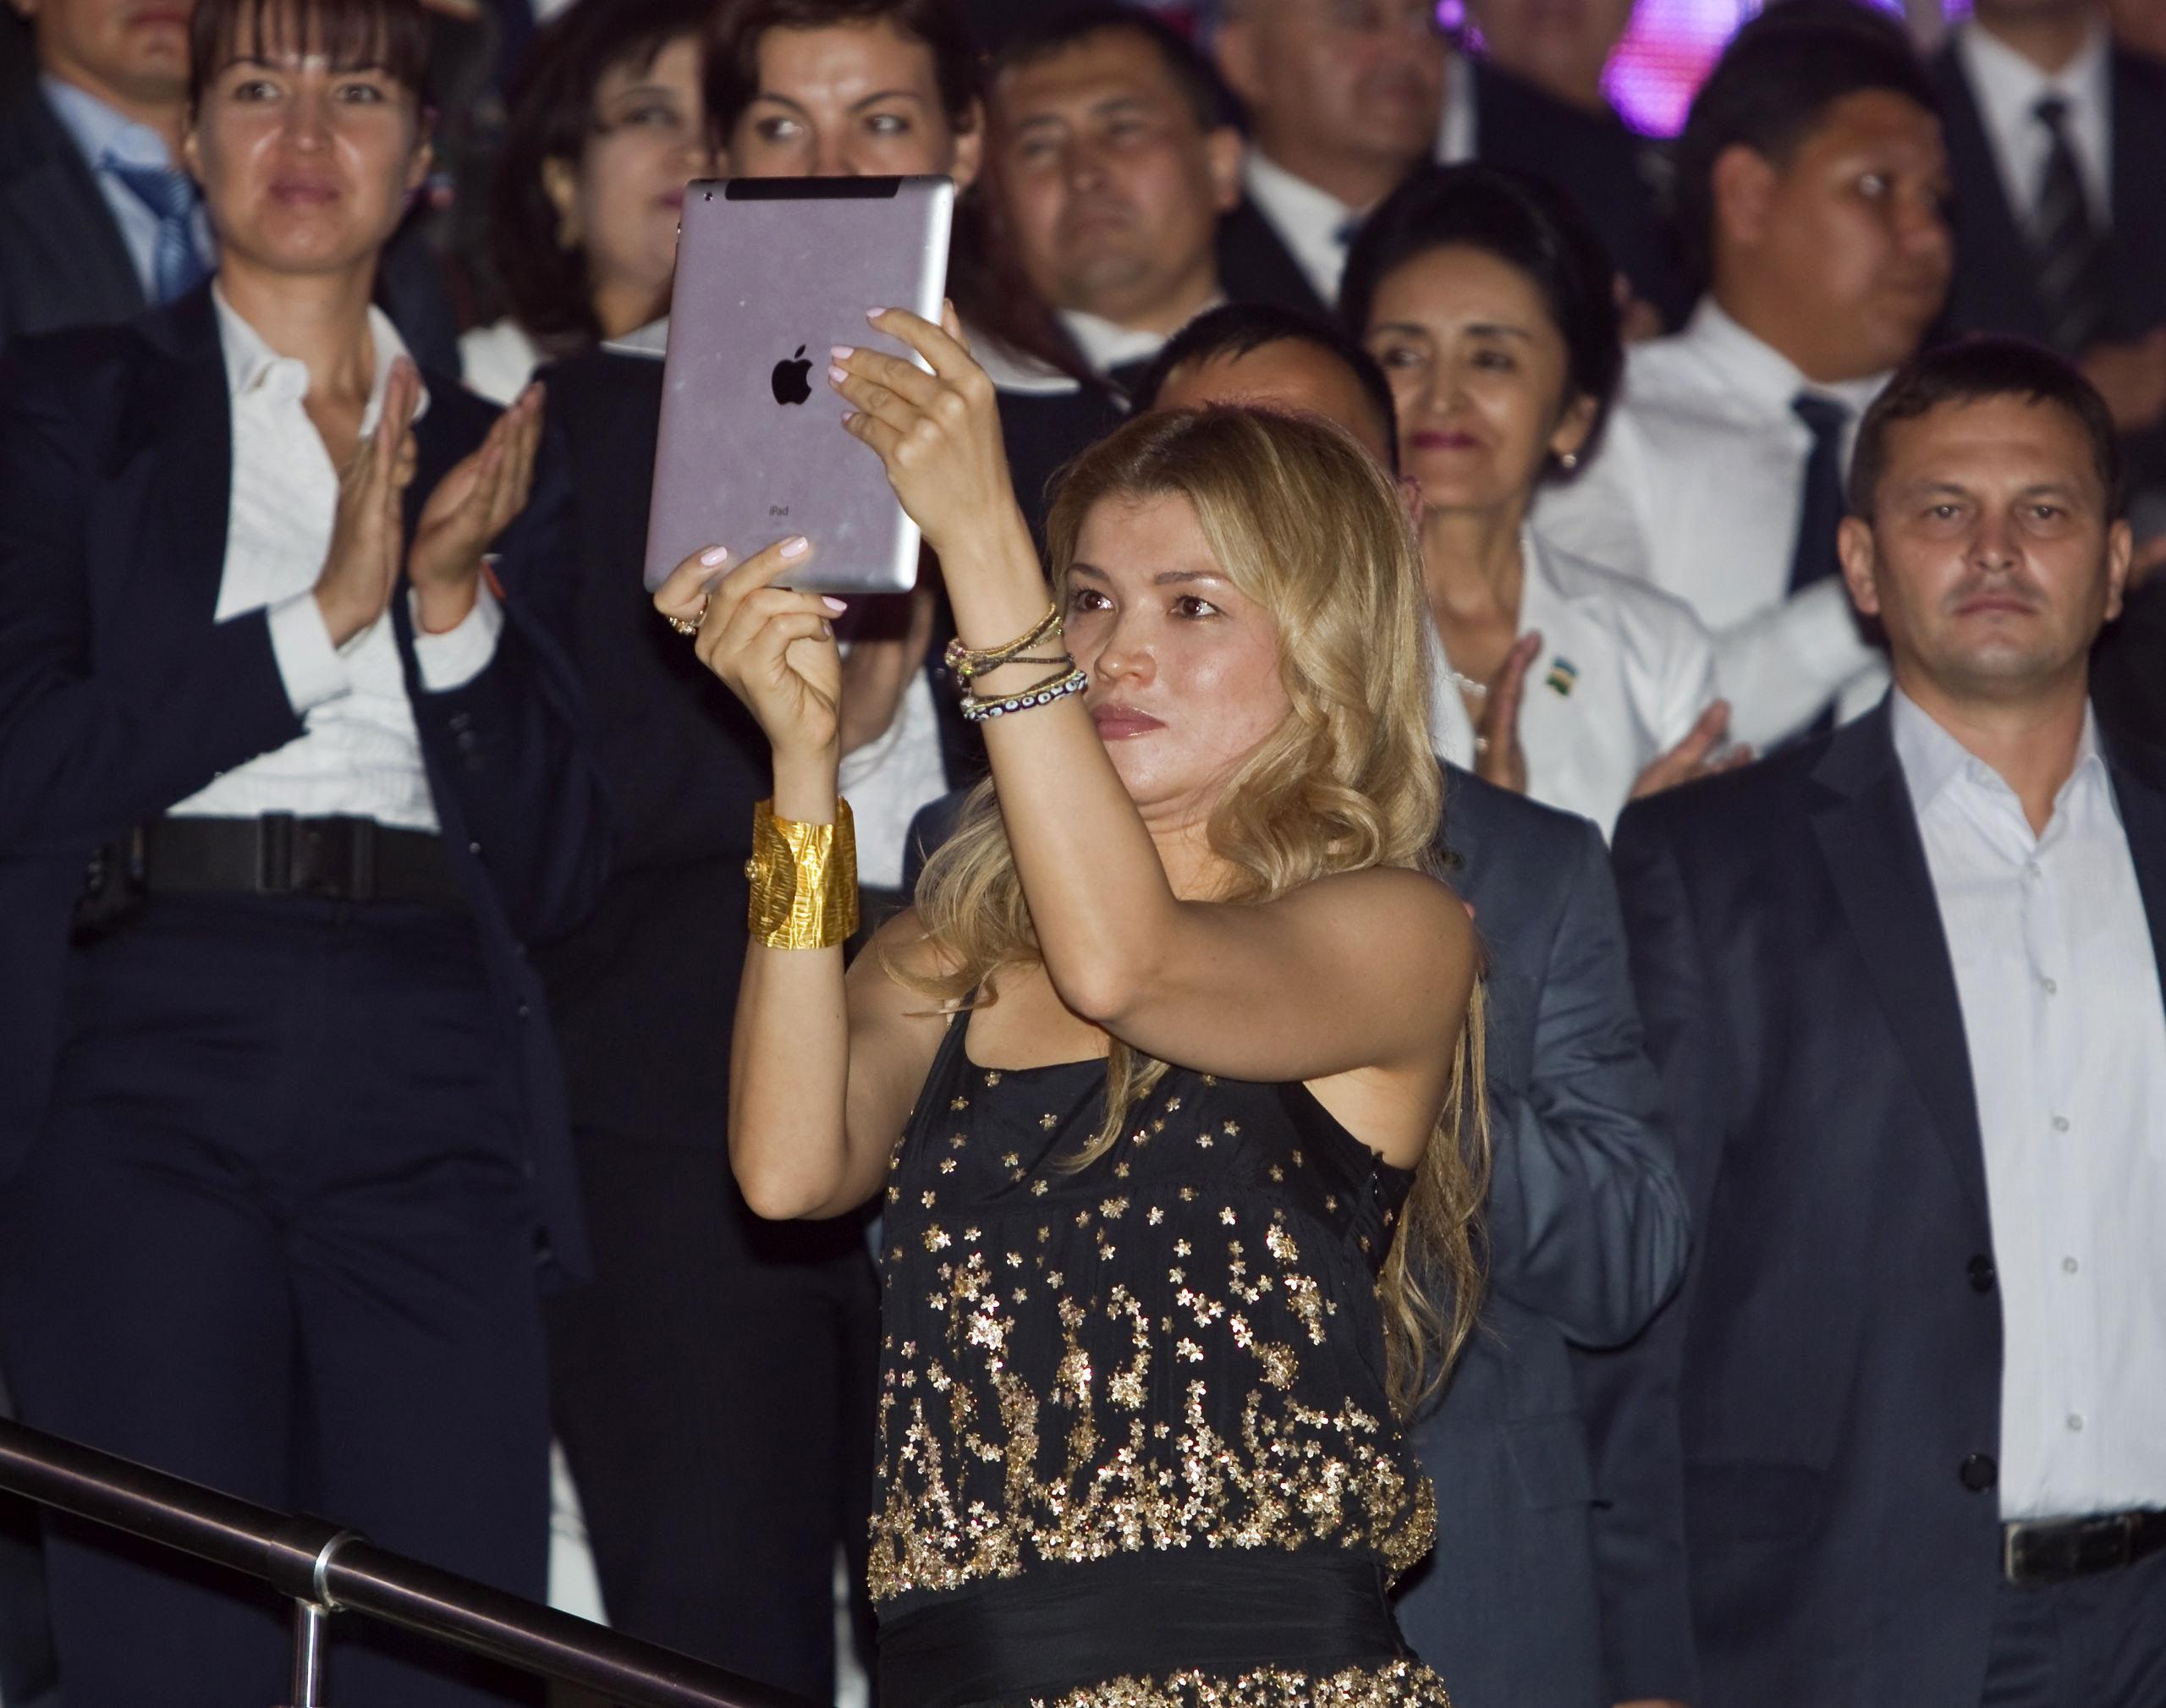 Gulnara Karimova (C), daughter of Uzbekistan's President Islam Karimov, takes a video with an Ipad as her father dances during an Independence Day celebration in Tashkent August 31, 2012. Uzbekistan is marking the 21st anniversary of independence.  REUTERS/Shamil Zhumatov  (UZBEKISTAN - Tags: POLITICS ANNIVERSARY) - GM1E8910FYR01